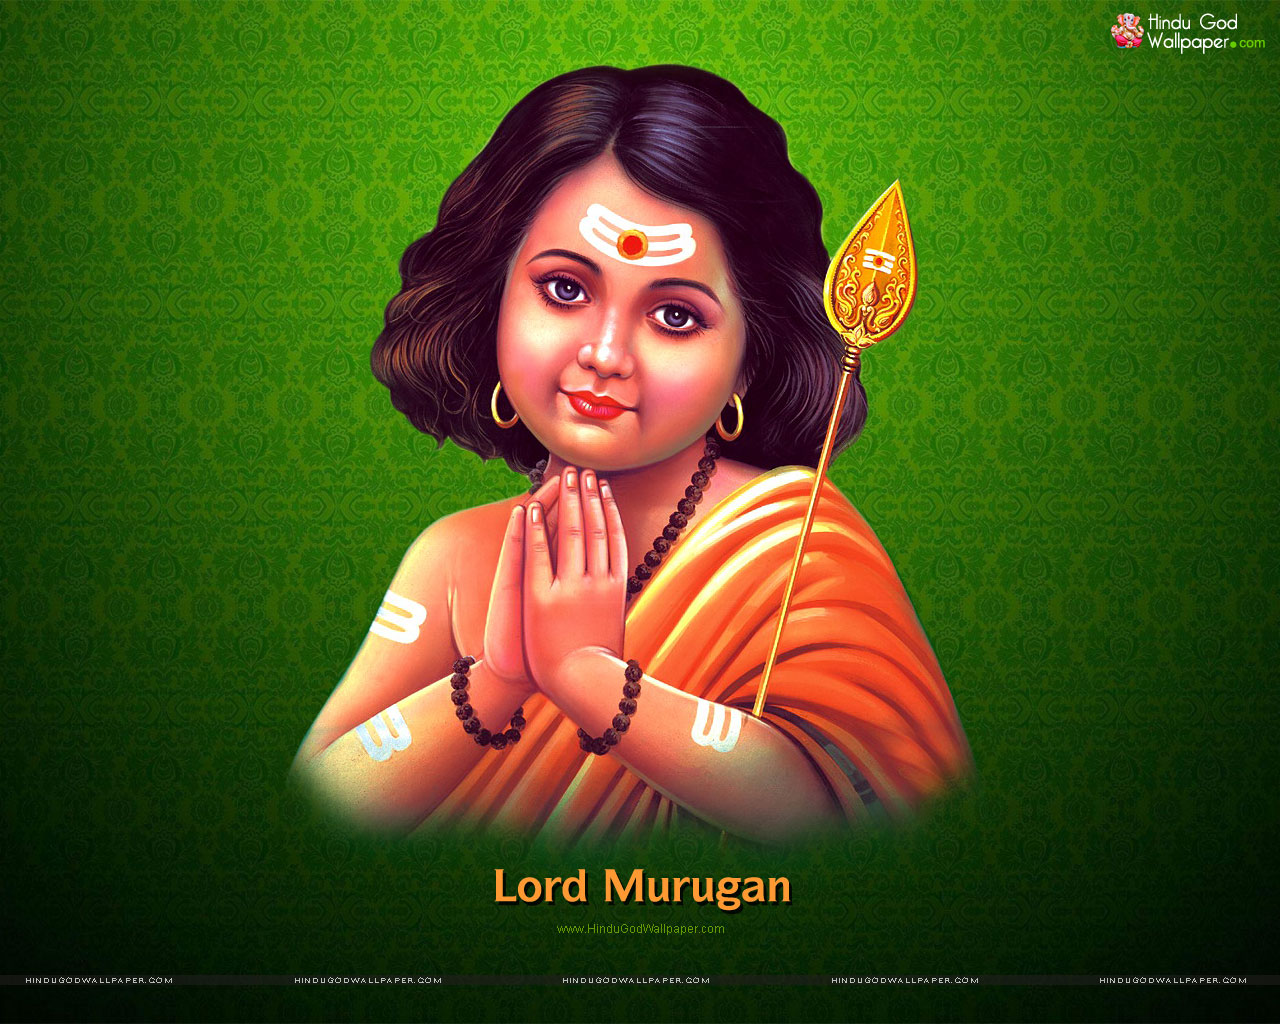 Lord Murugan Wallpapers Top Free Lord Murugan Backgrounds Wallpaperaccess